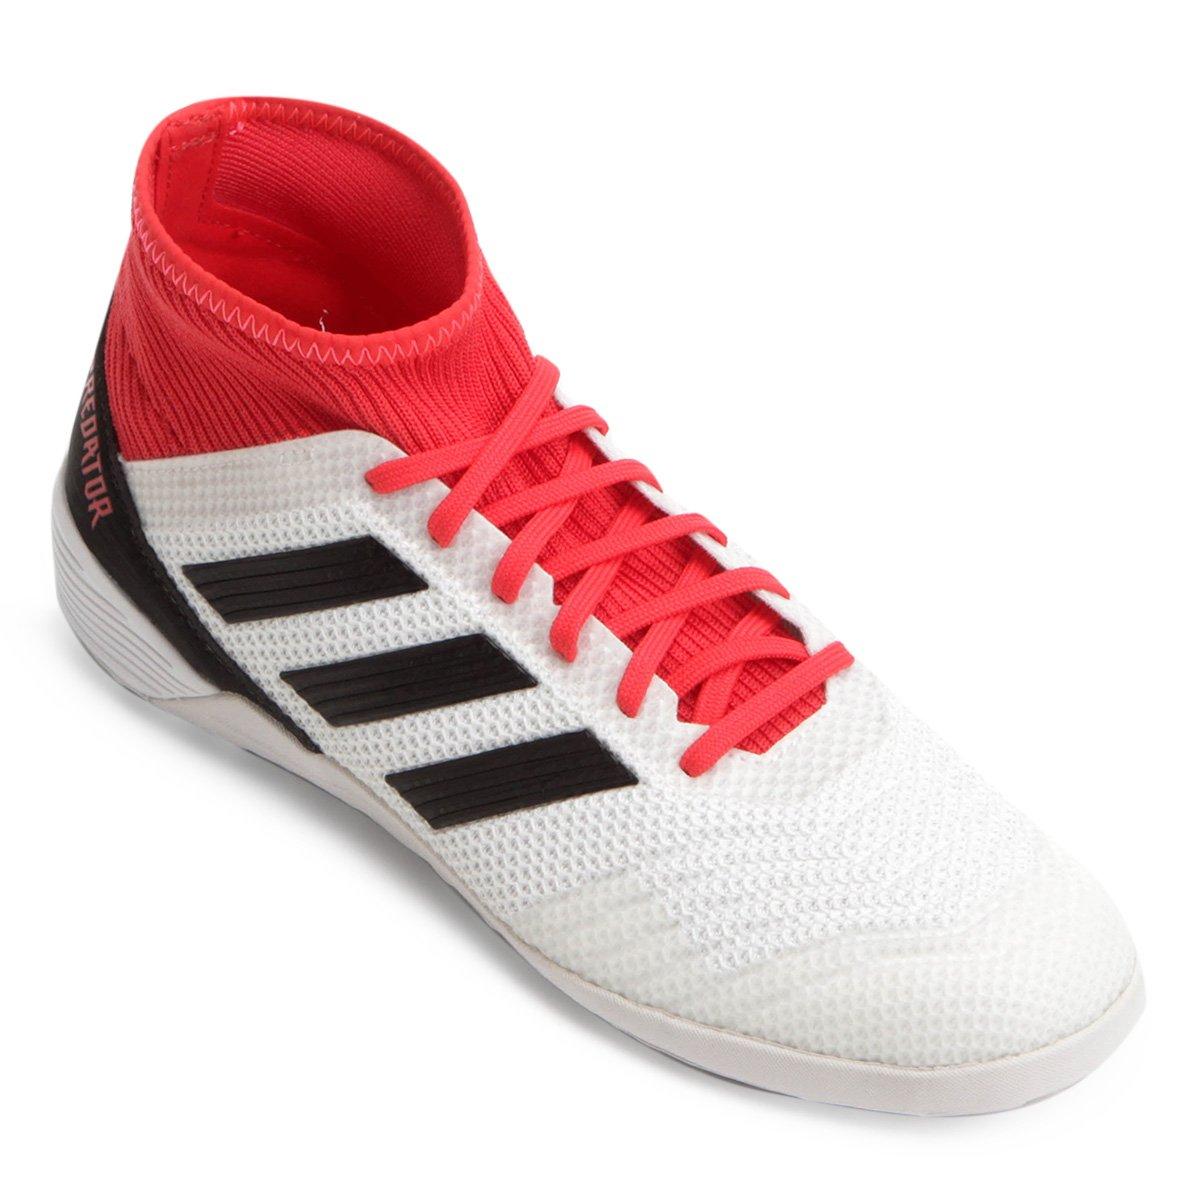 41e27b7ecd153 ... australia good chuteira futsal adidas predator 18 3 in masculina  brancovermelho 8fd1e 71a0f d5a27 bd786